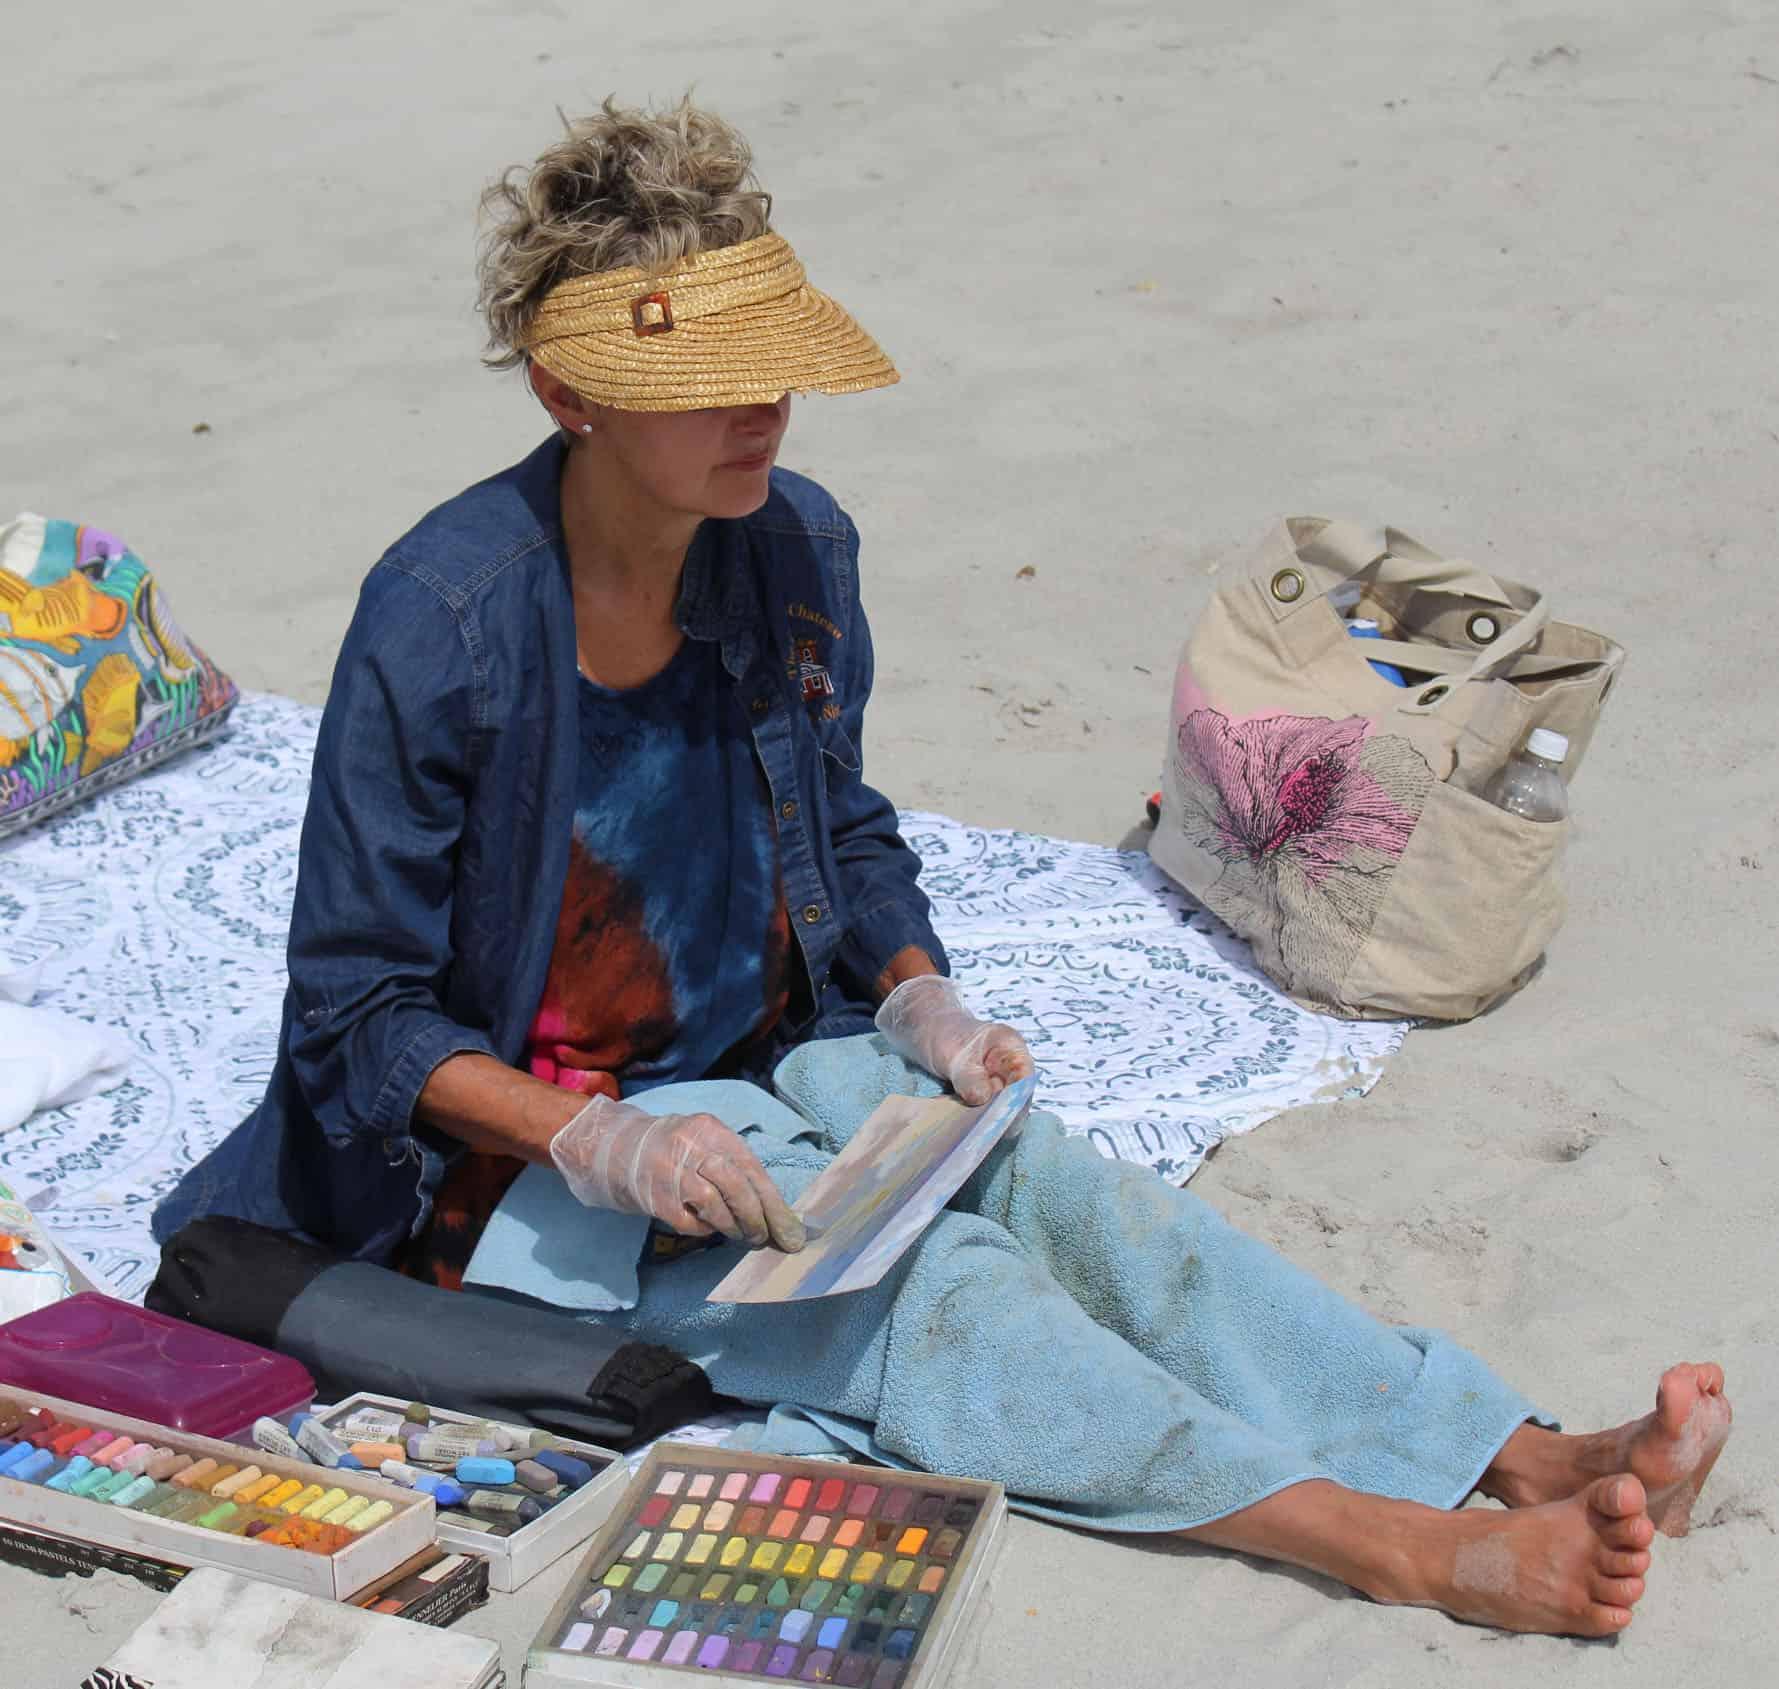 Terri Painting at Myrtle Beach